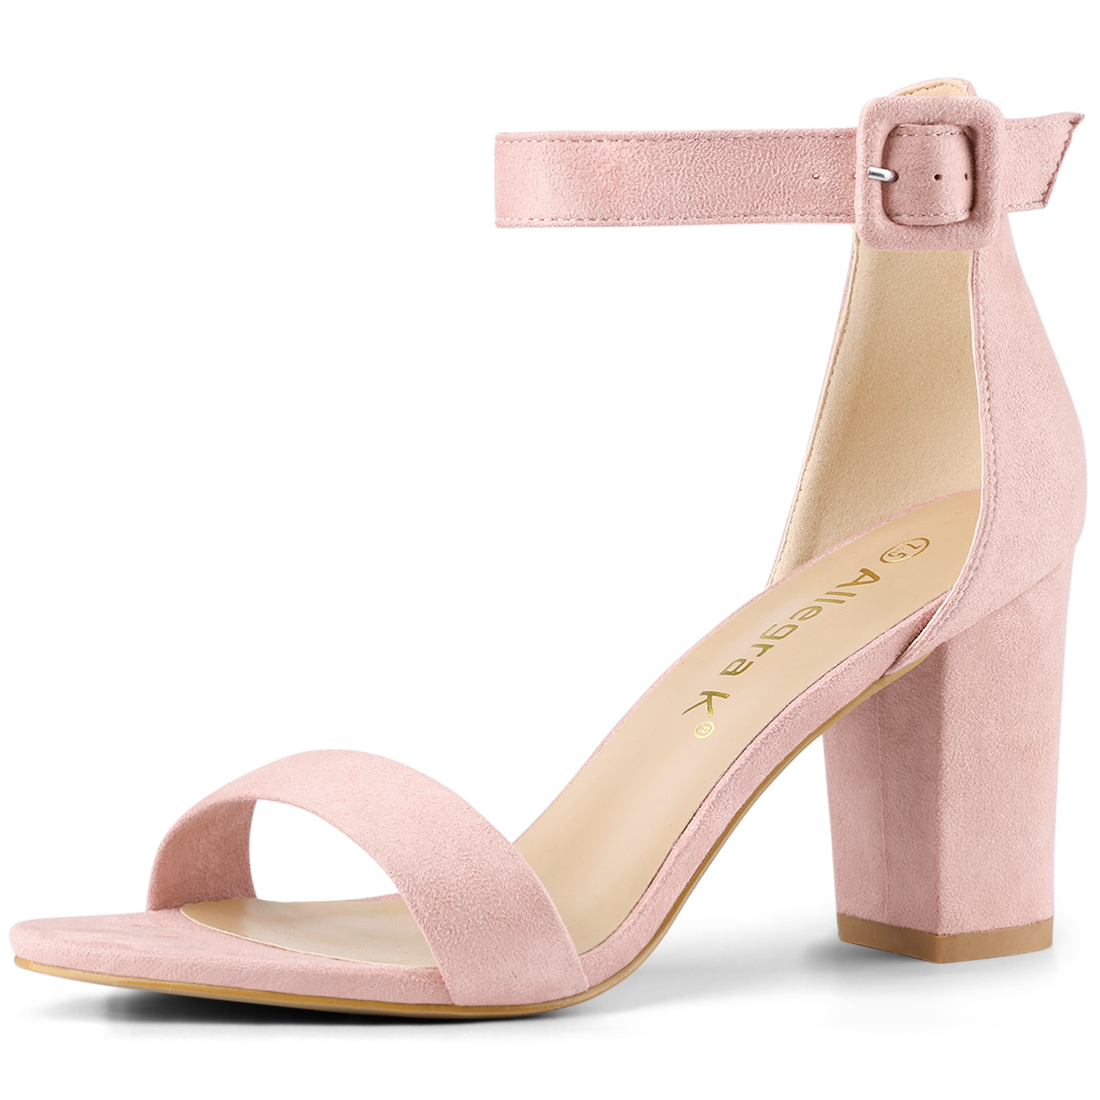 Allegra K Women's Open Toe Chunky High Heel Ankle Strap Sandals Light Pink US 7